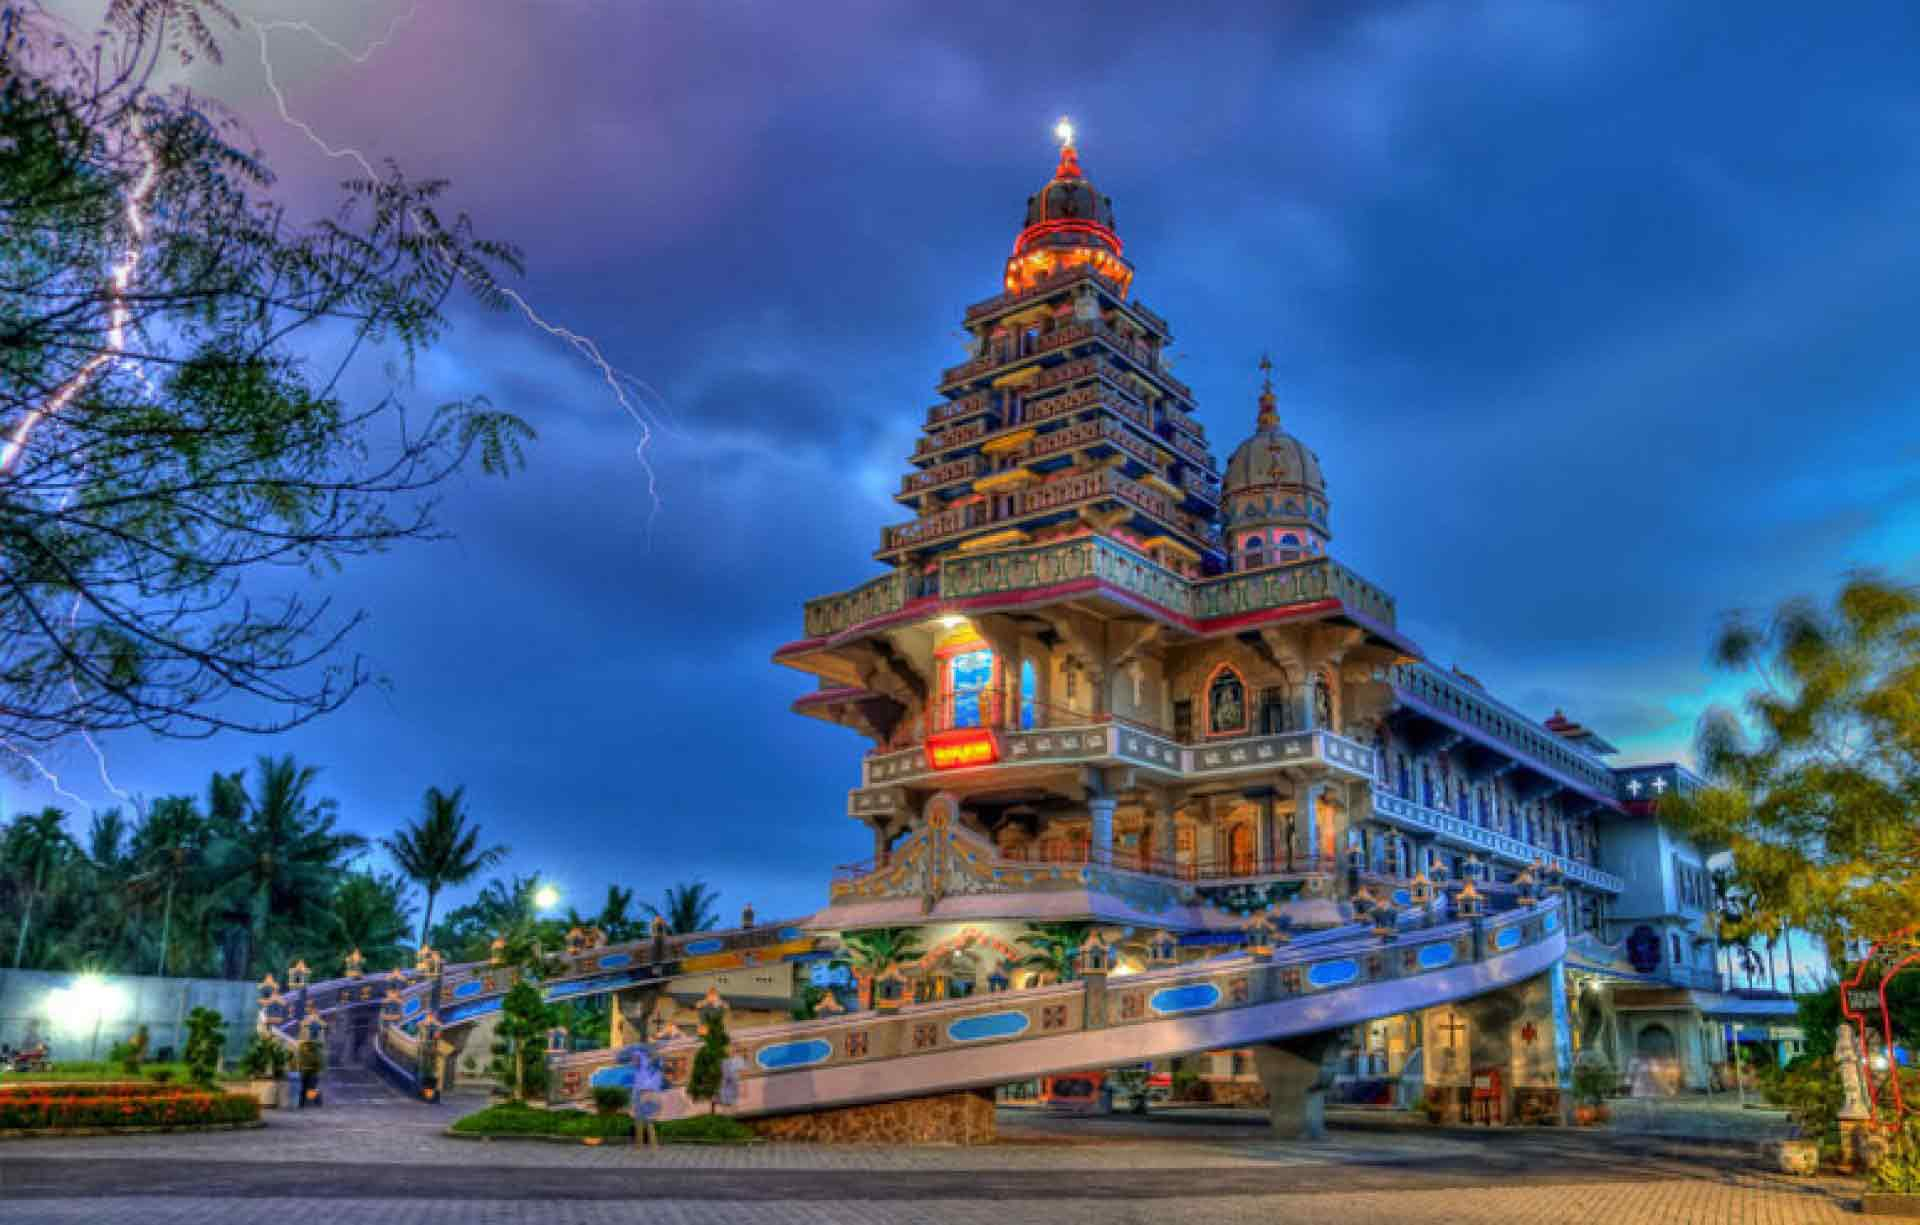 Desain gereja Annai Maria Velangkanni yang menyerupai tempat ibadah umat Hindu India (Sumber: instantbooking.id)